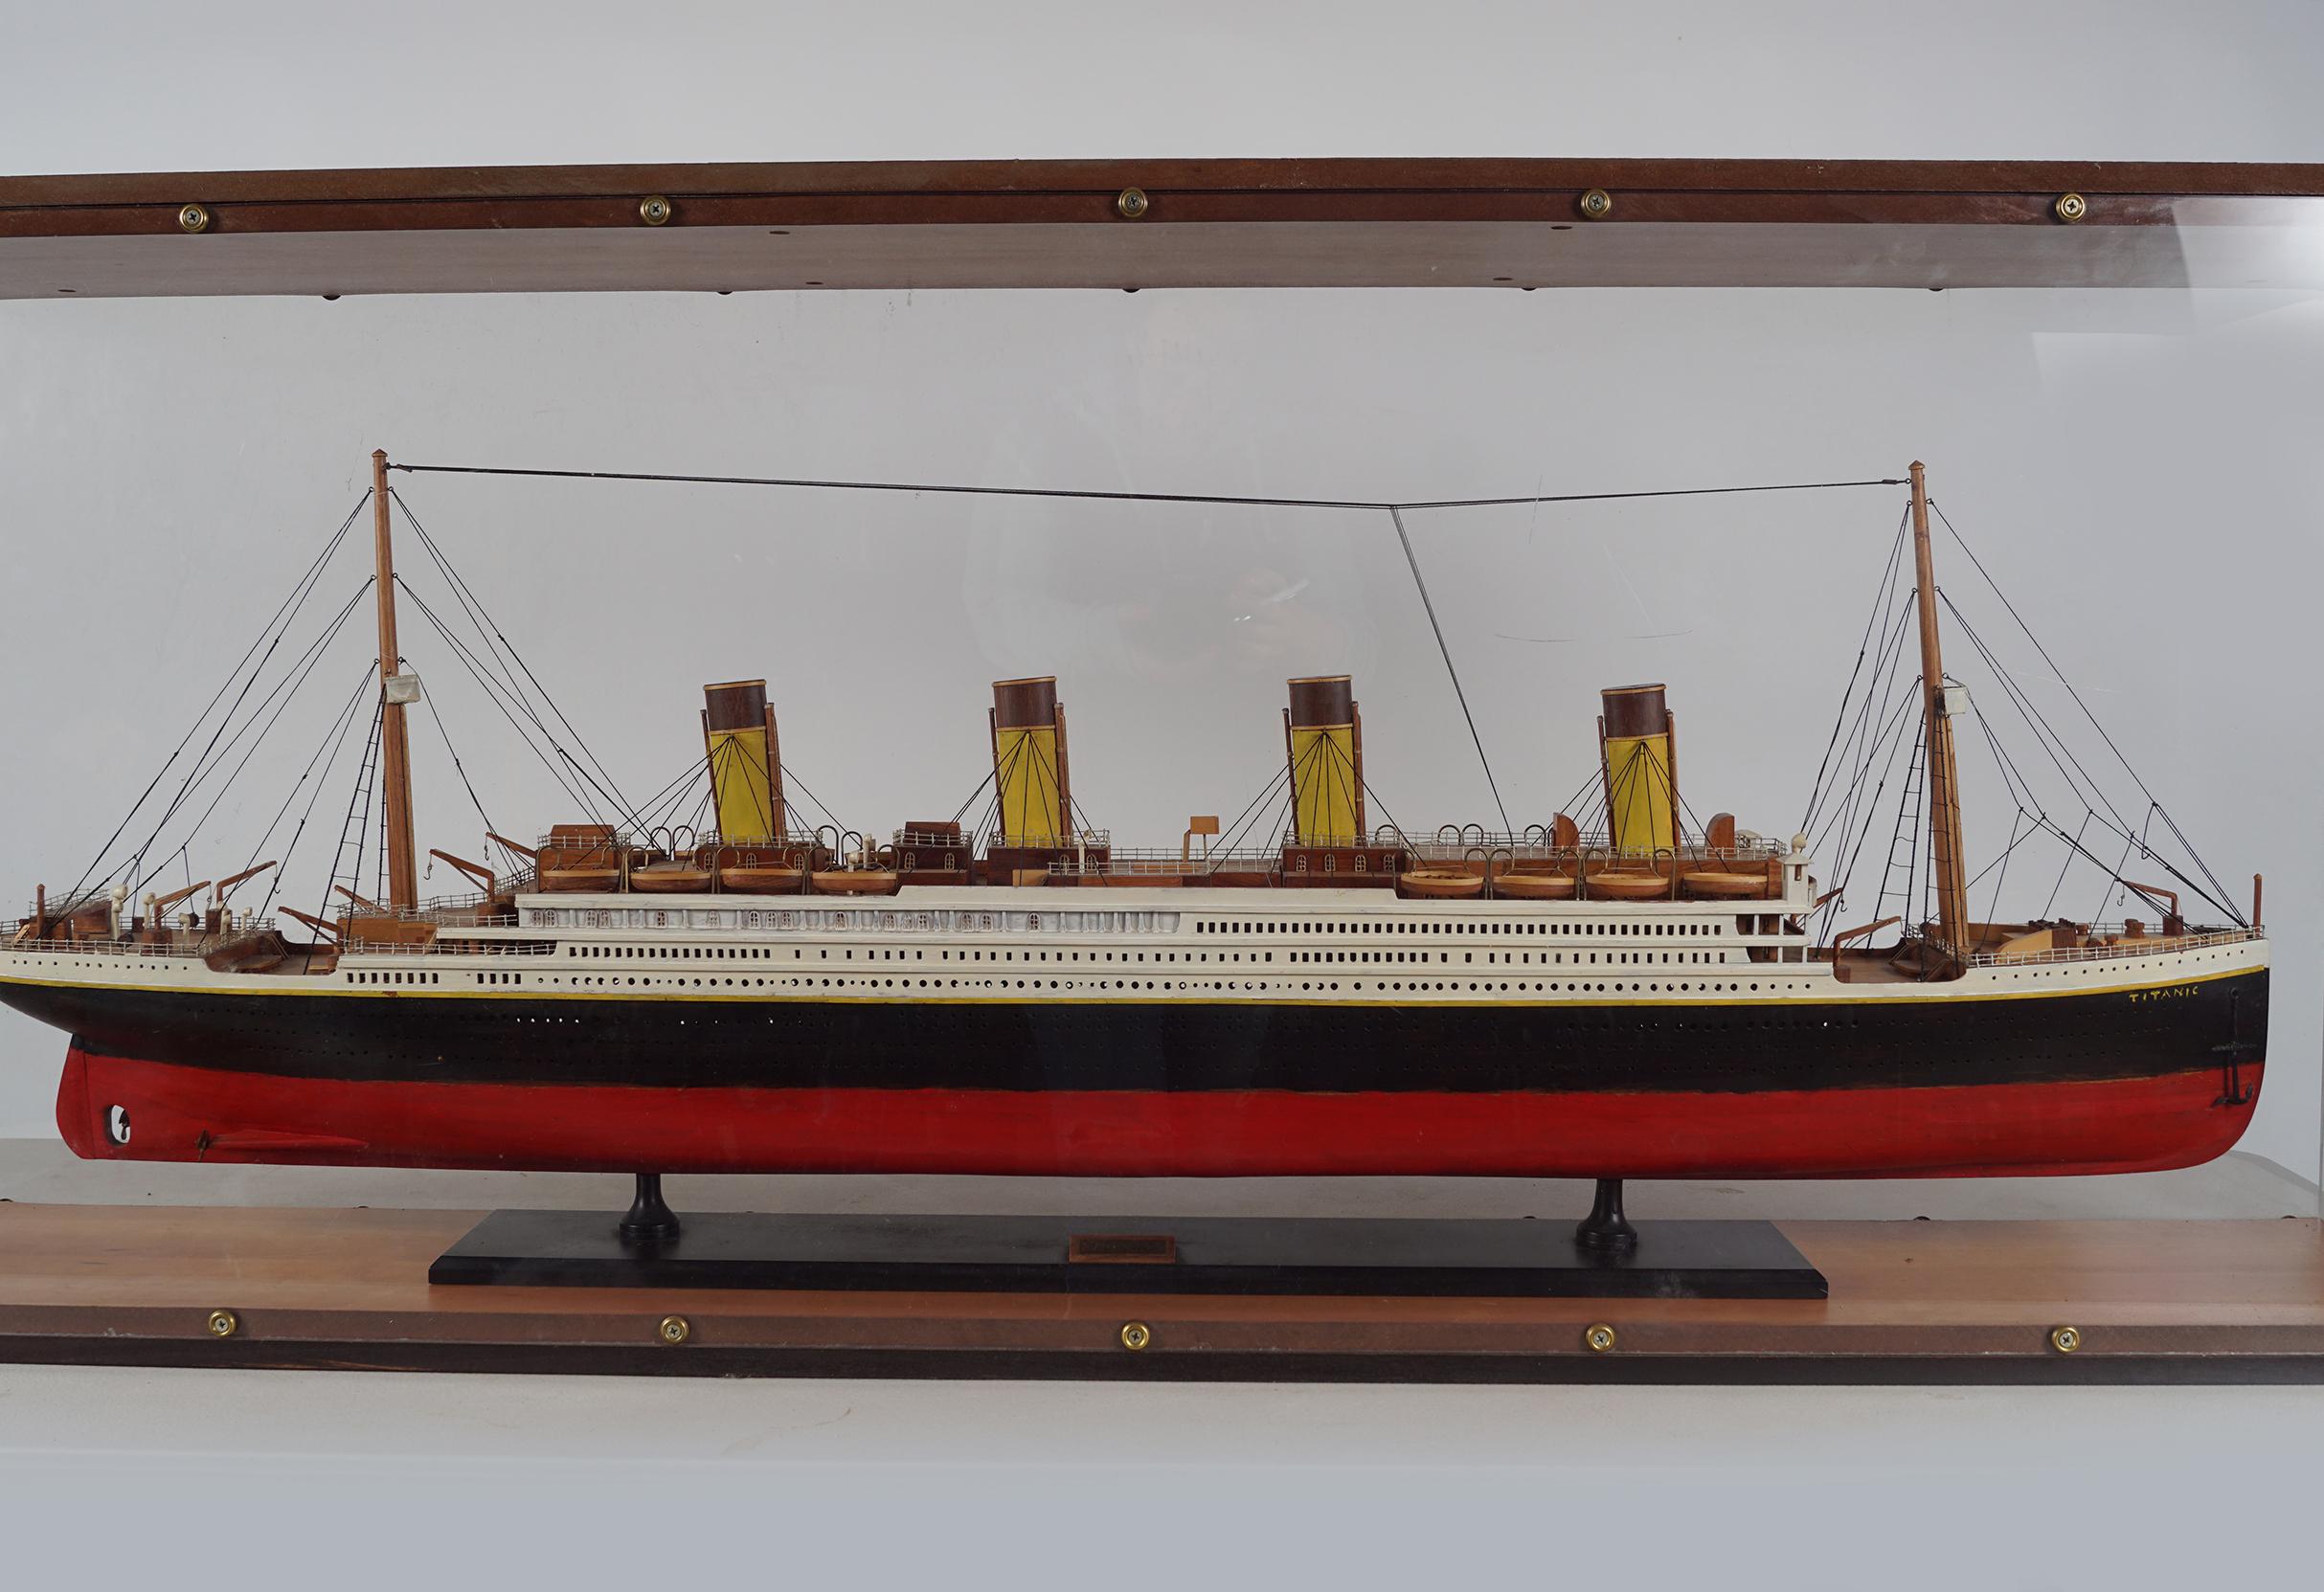 LARGE MODEL STEAM SHIP - Image 2 of 8